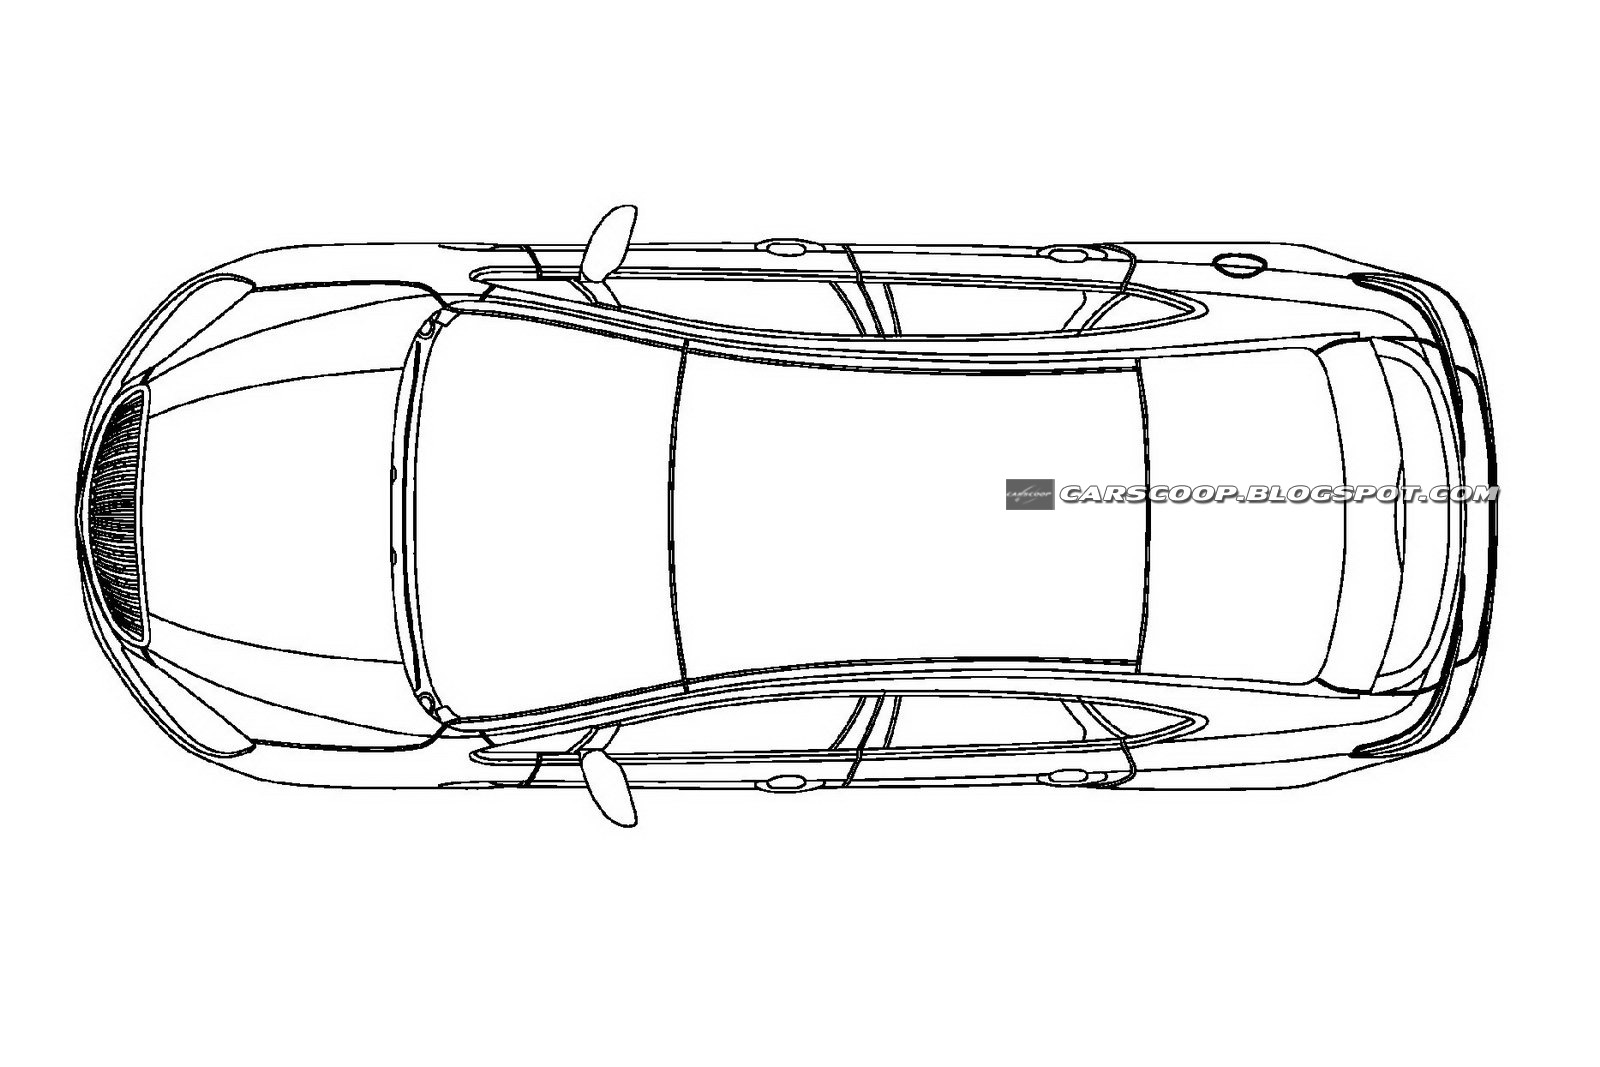 U S Patent Drawings Of 2012 Buick Excelle Sedan